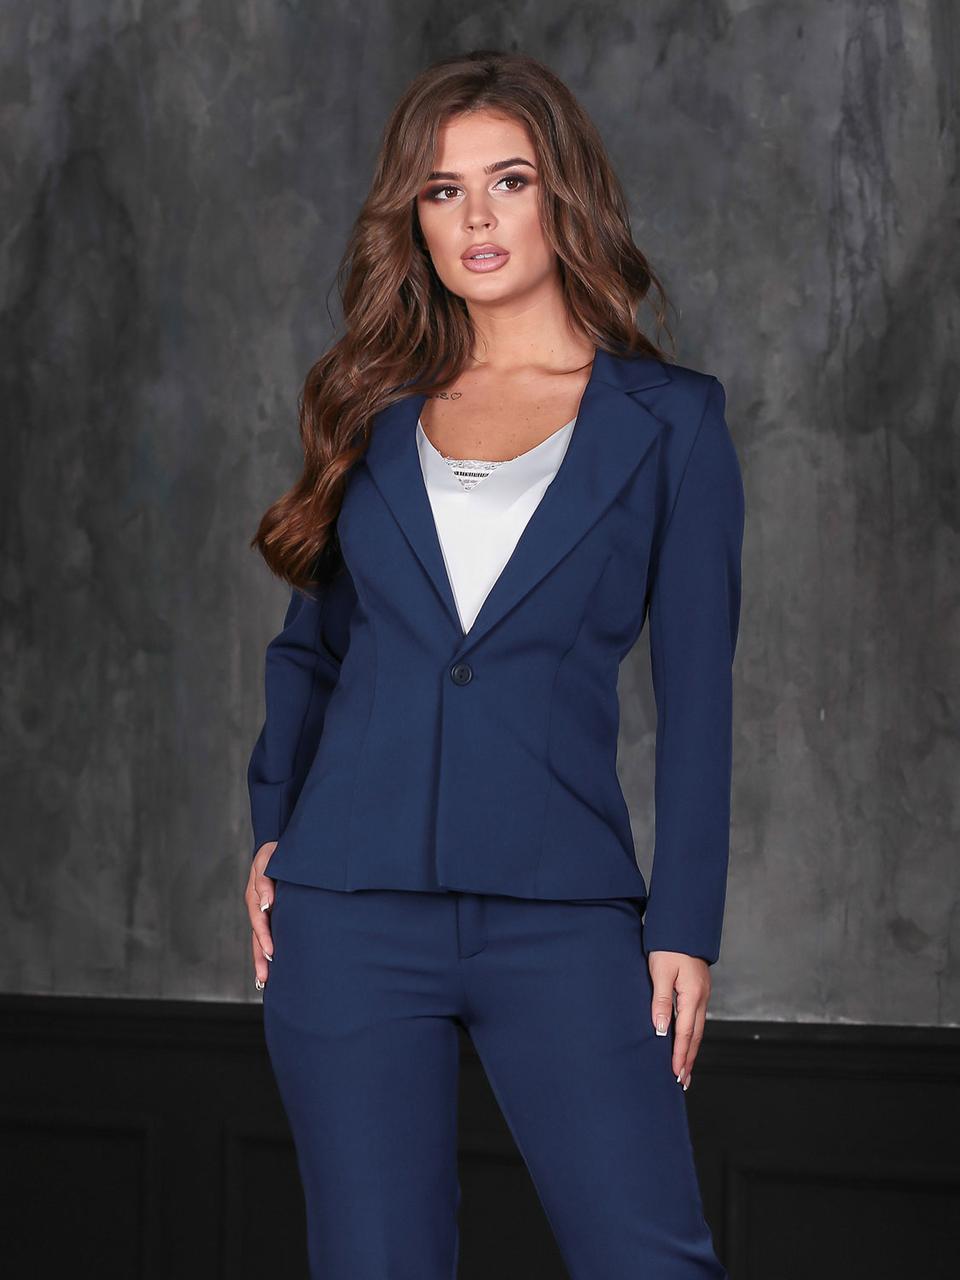 bc26a2f95720072 Темно-синий брючный Костюм с пиджаком: продажа, цена в Одессе ...